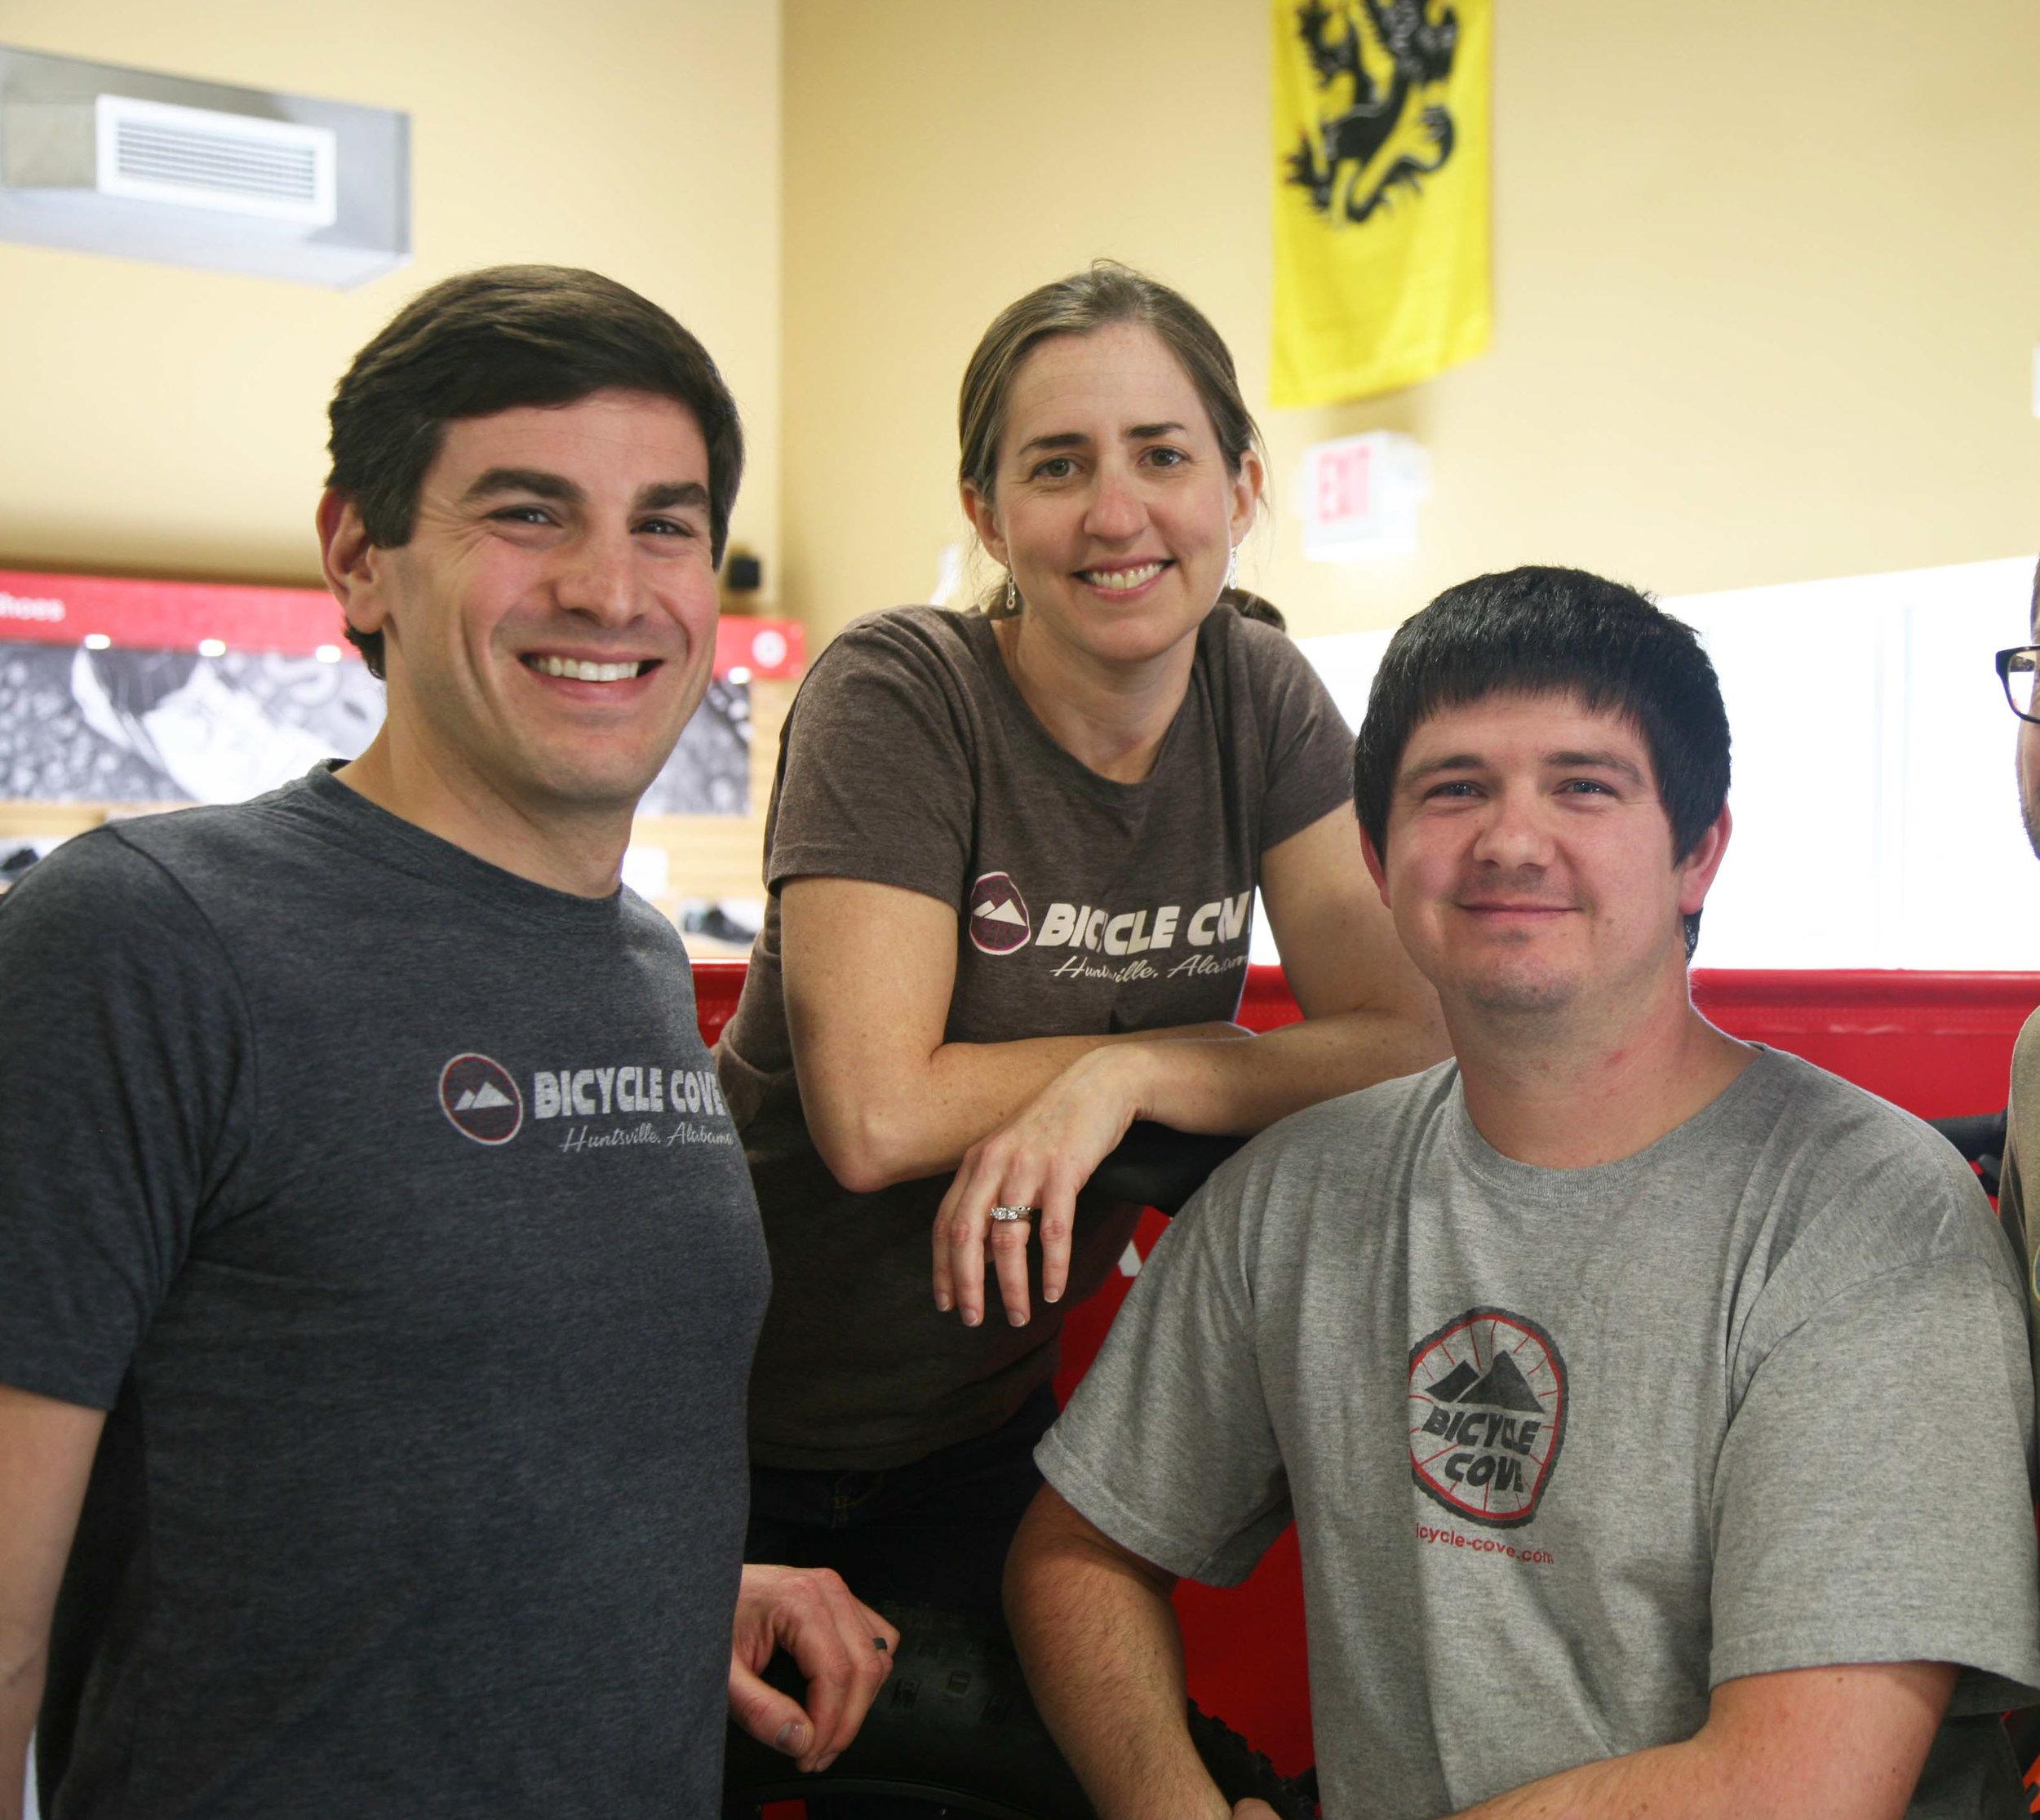 Chris, Jessica and Nick